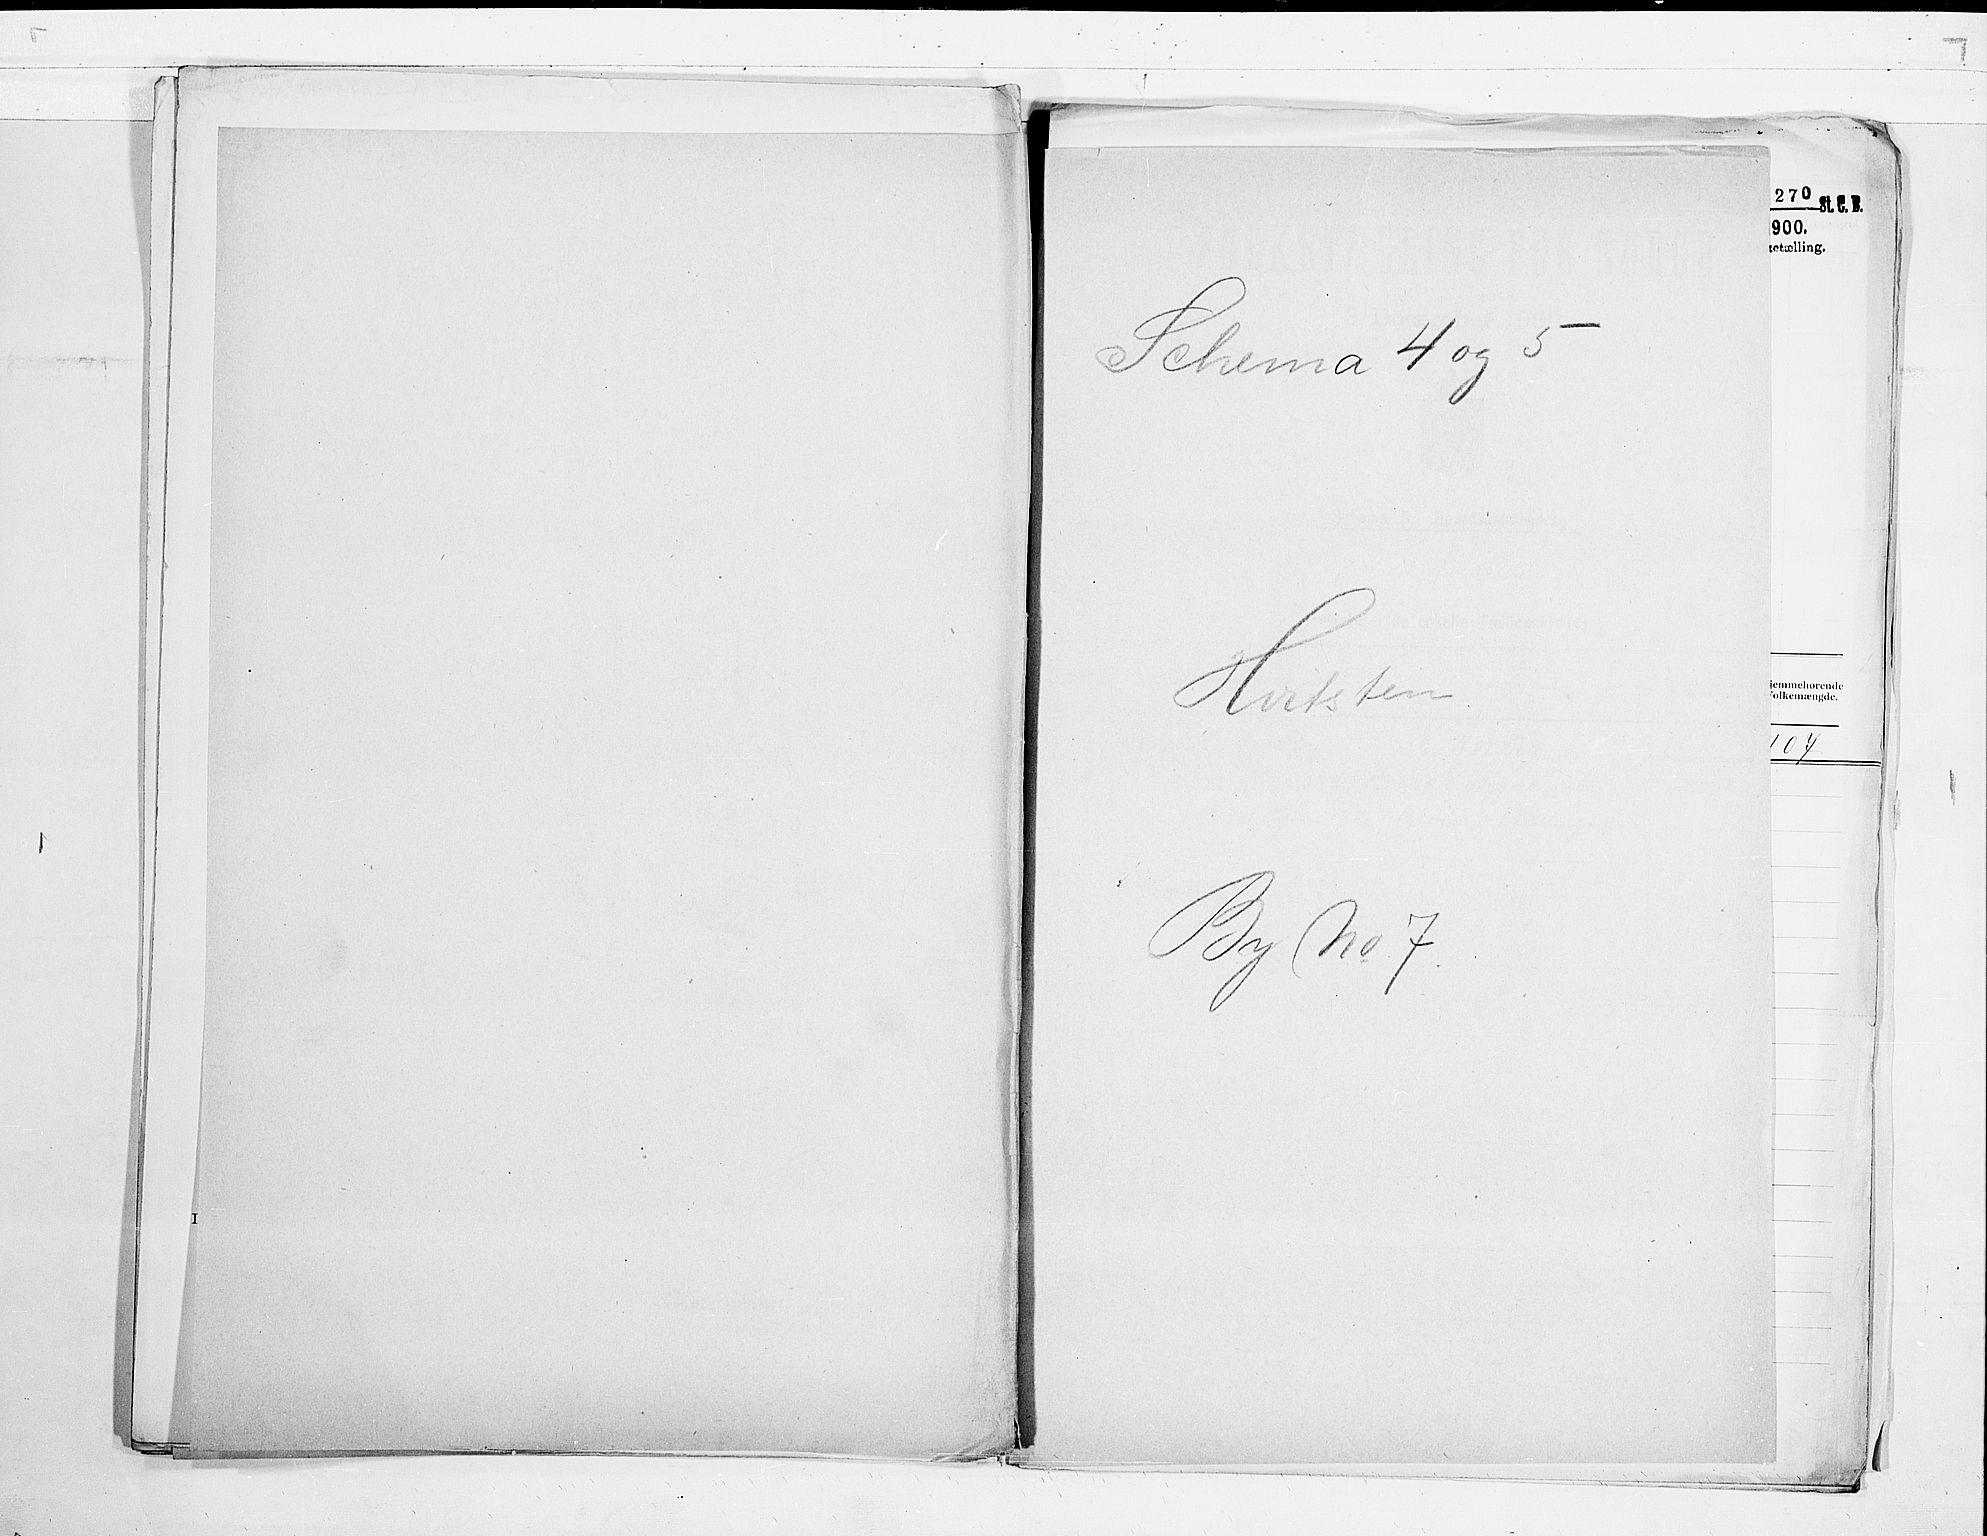 SAO, 1900 census for Hvitsten, 1900, p. 1